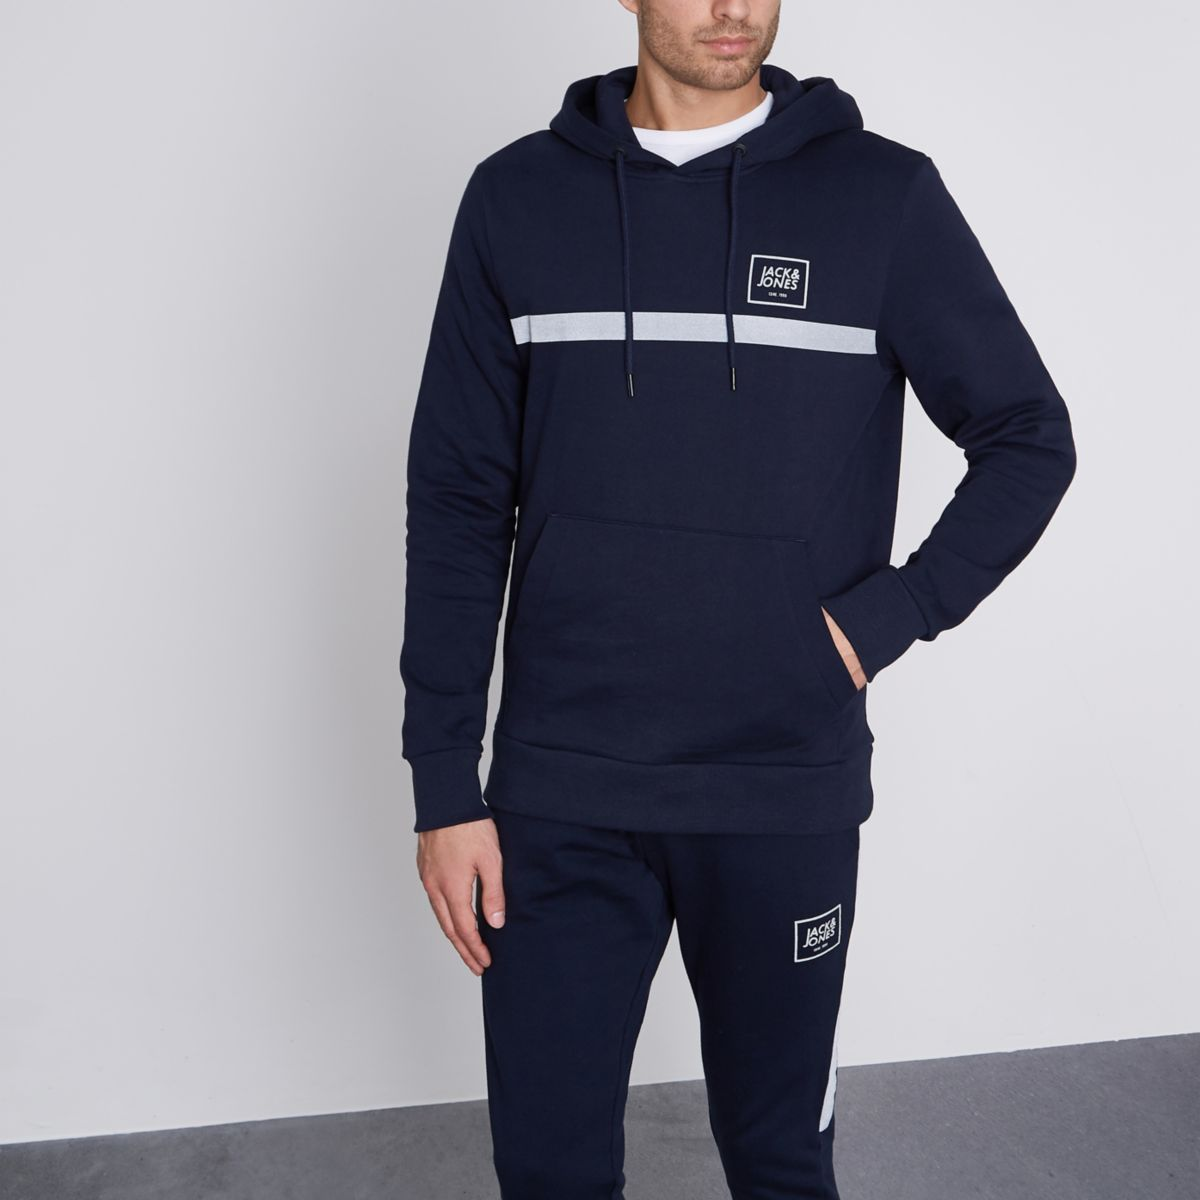 Jack & Jones Core navy print hoodie